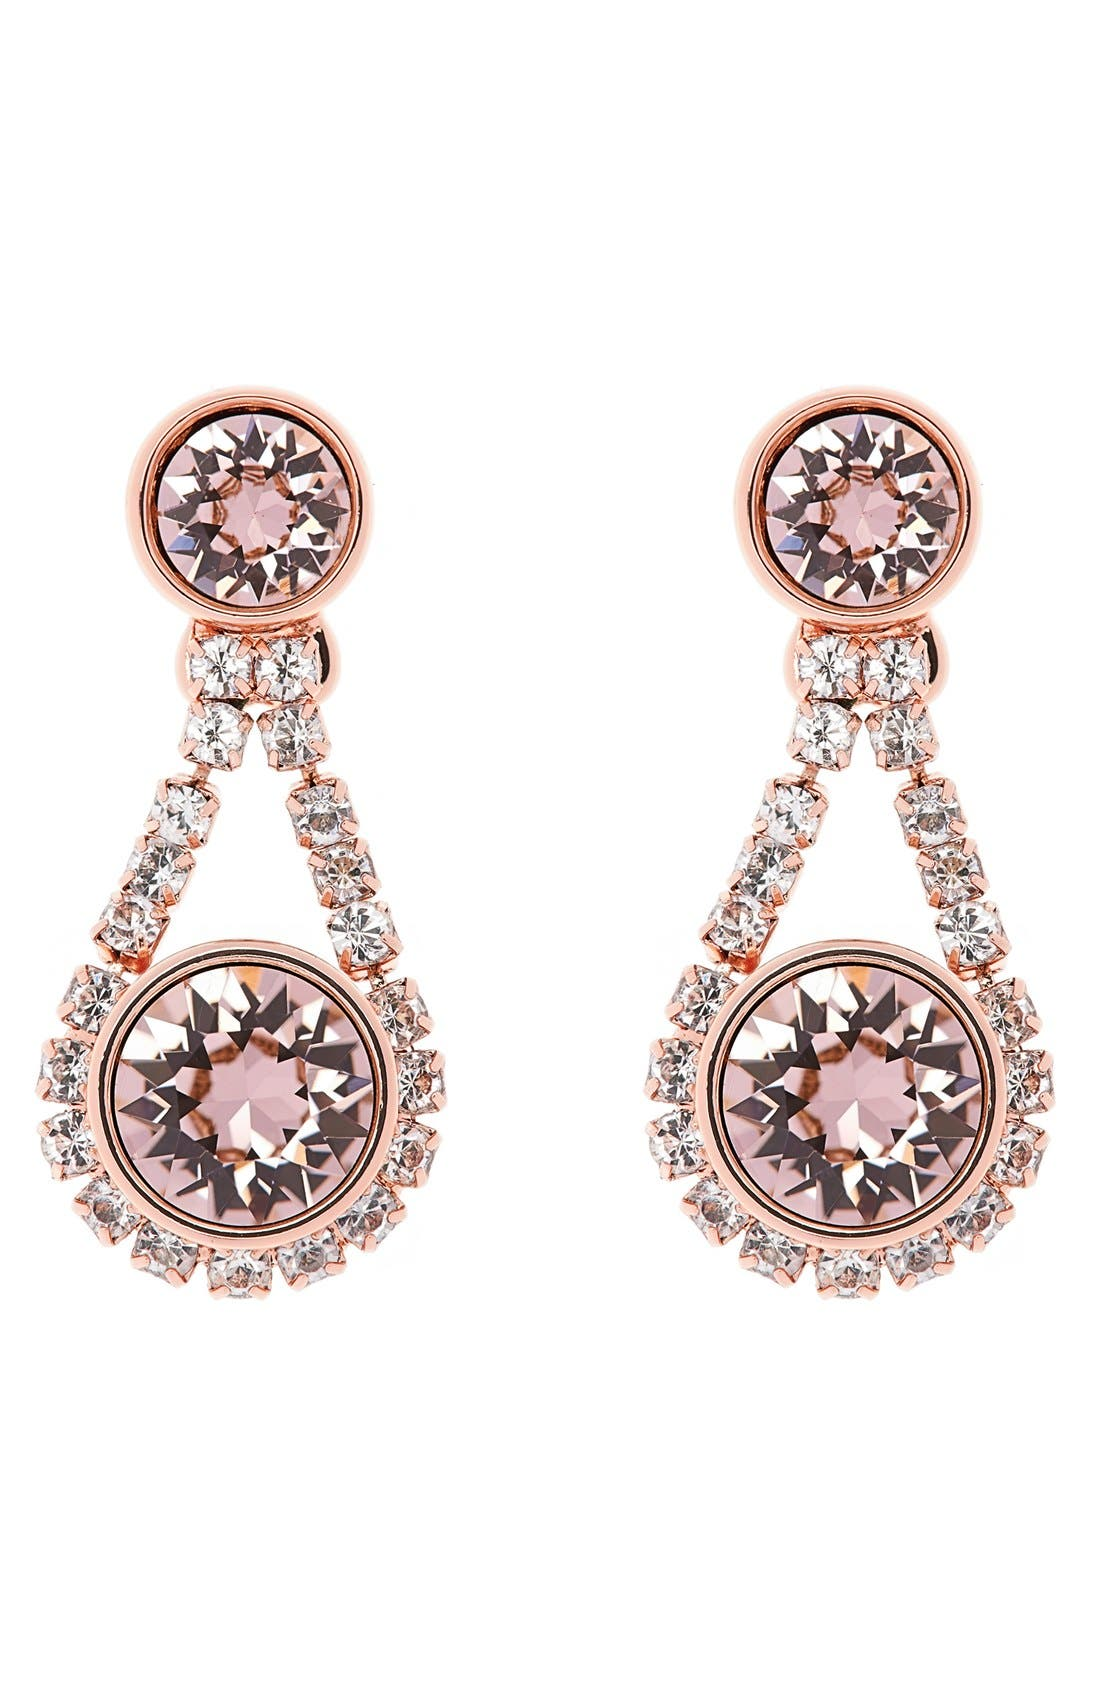 Alternate Image 1 Selected - Ted Baker London 'Crystal Daisy' Drop Earrings